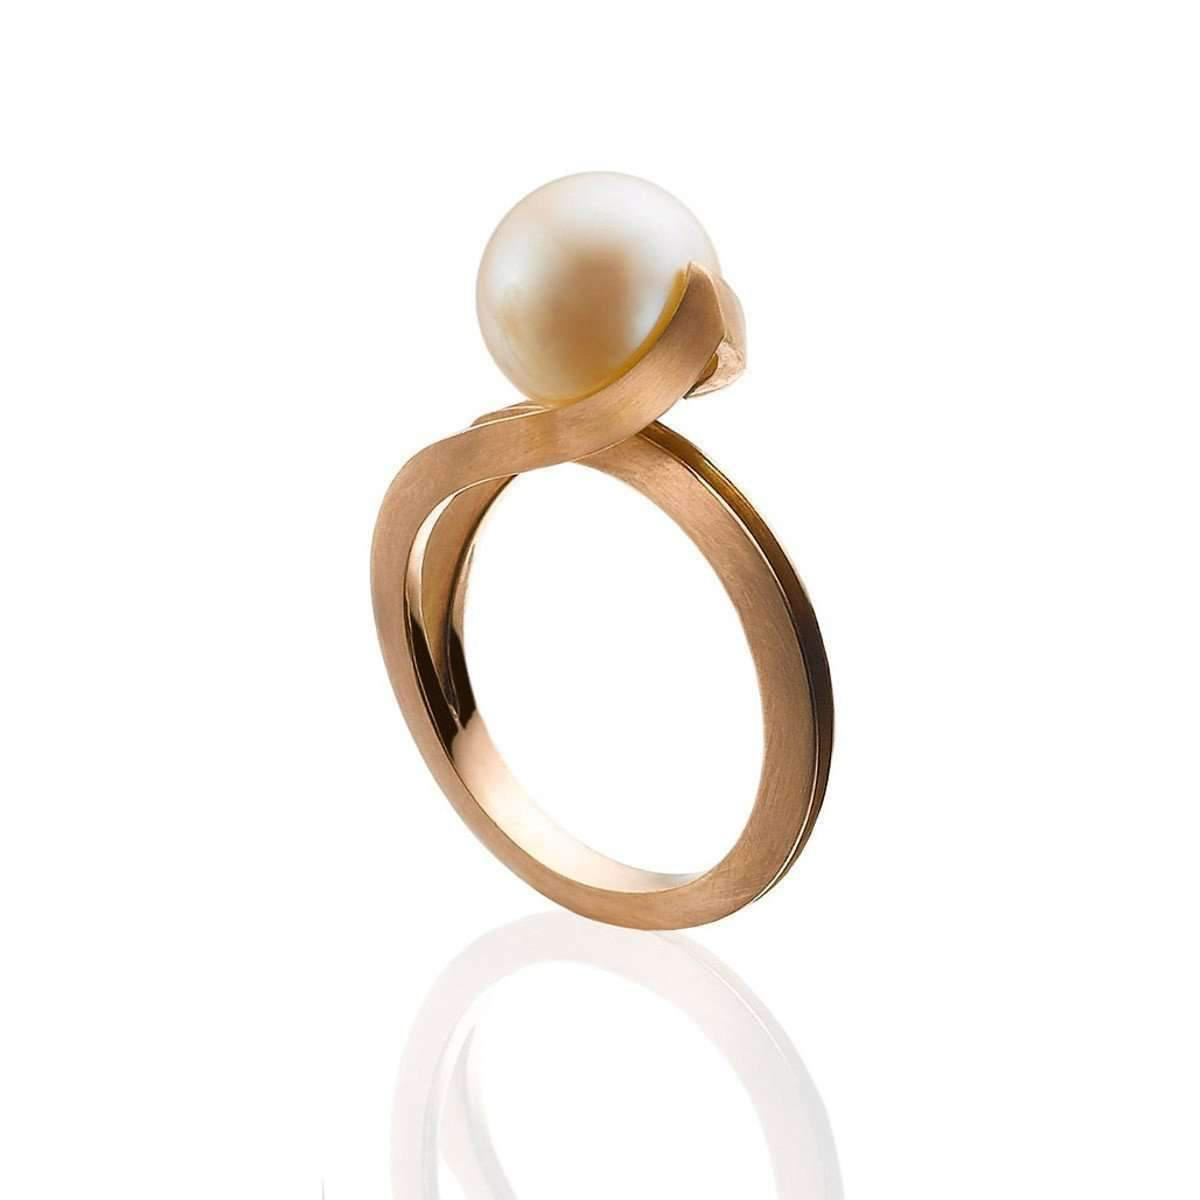 London Road Jewellery Burlington Yellow Gold Willow Pearl RIng - UK L - US 5 1/2 - EU 51 3/4 YTlds2Hw